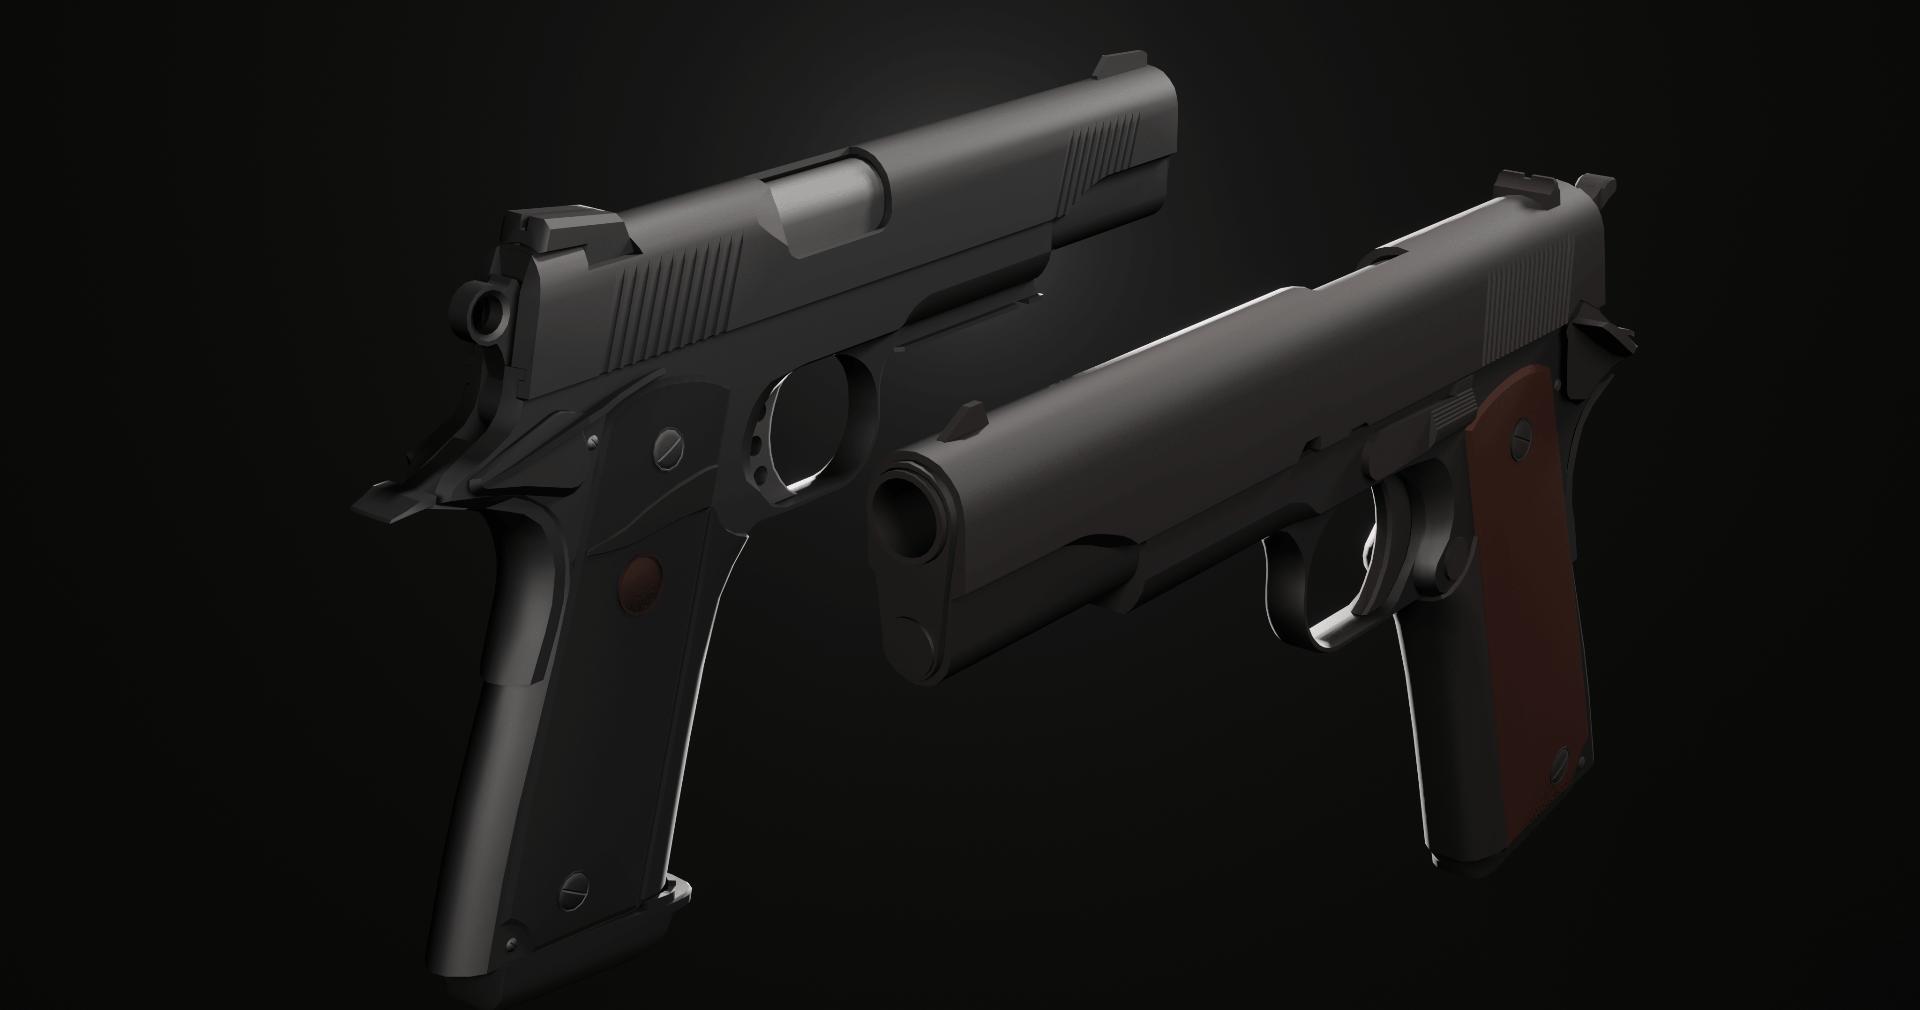 Colt M1911/MEUSOC M45 | 3D моделлер, ищу разовые заказы/команду инди разработчиков